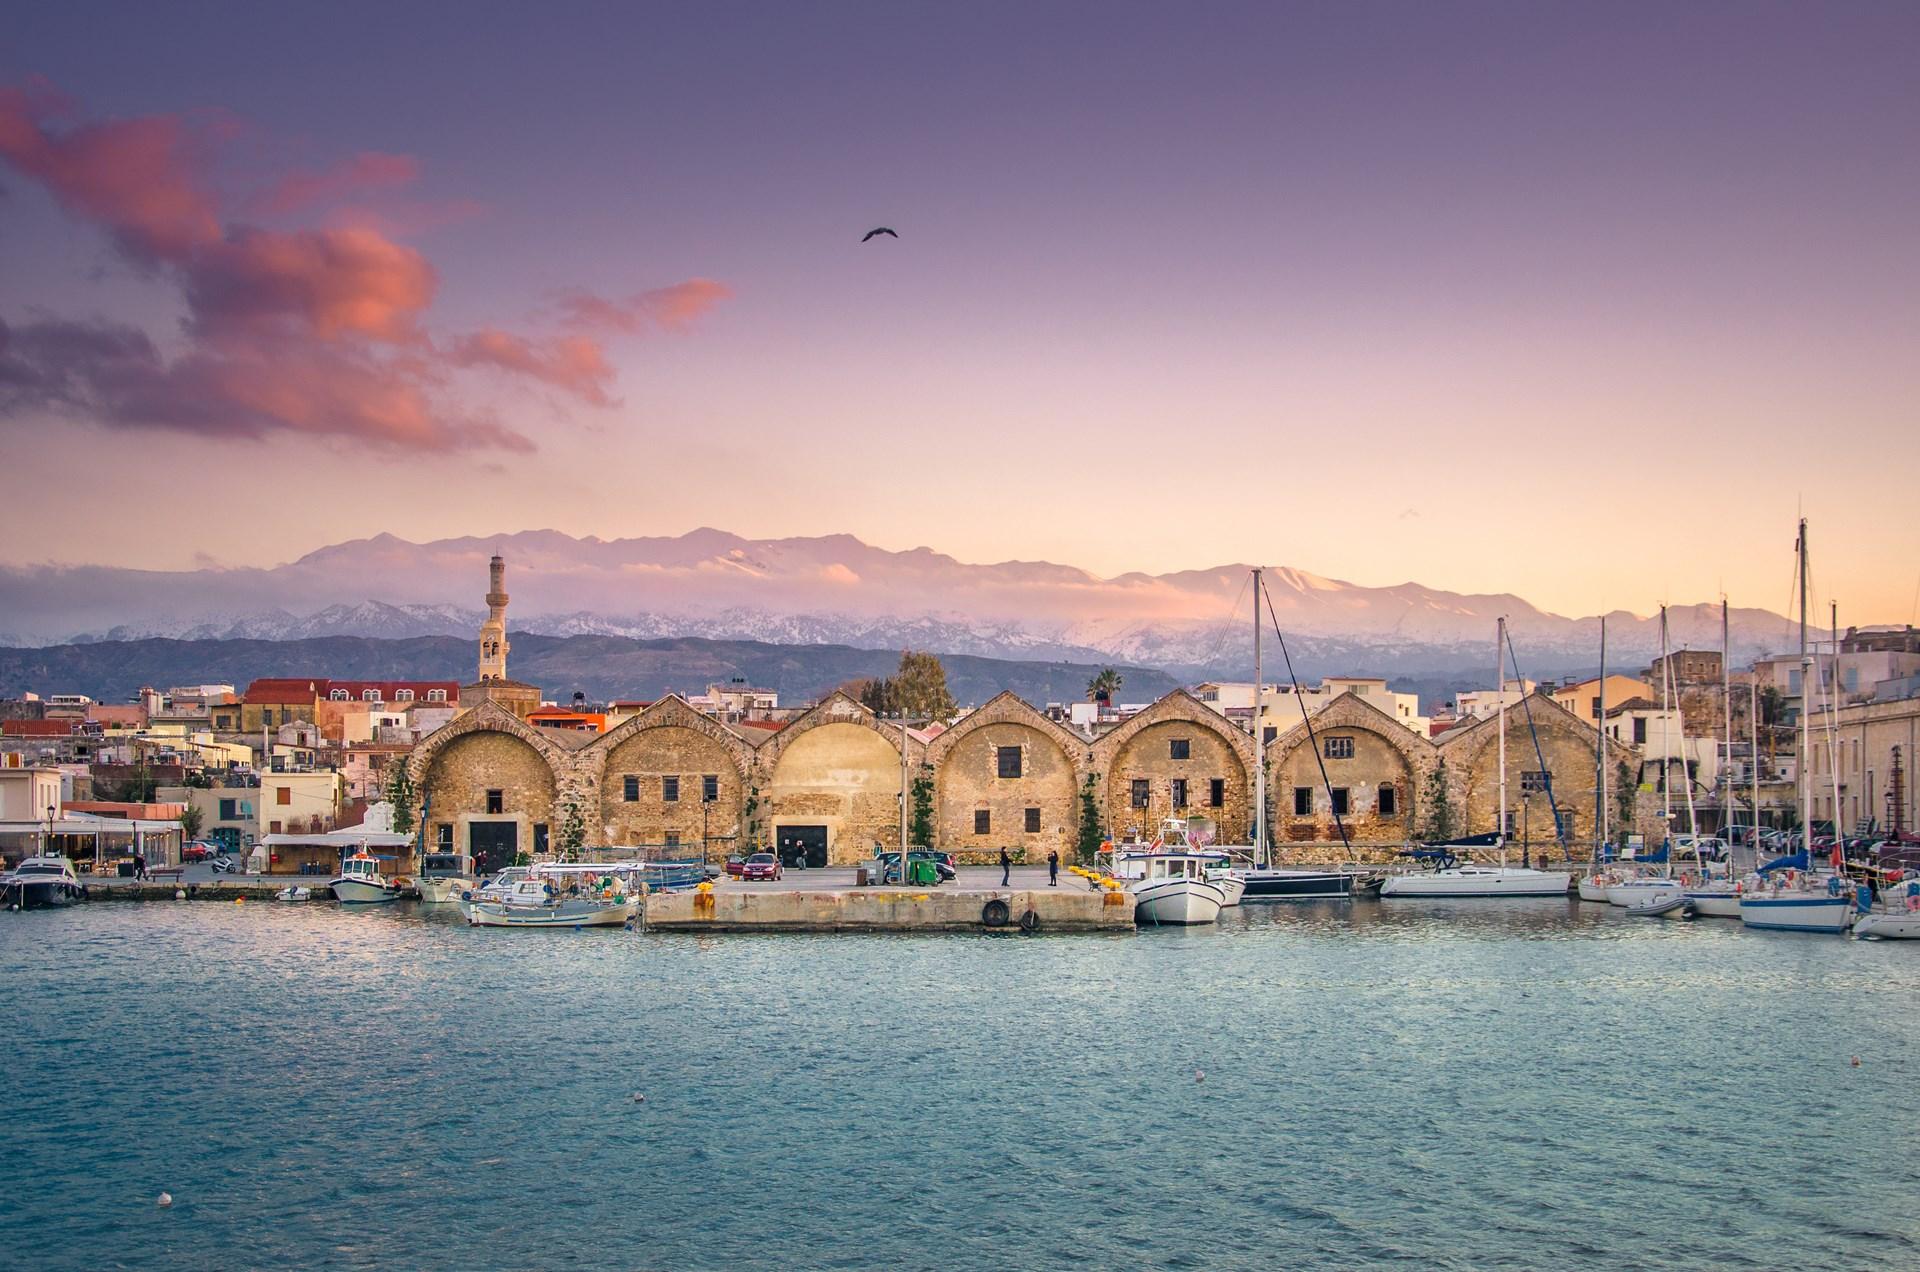 Crete. Top souvenirs to bring back home